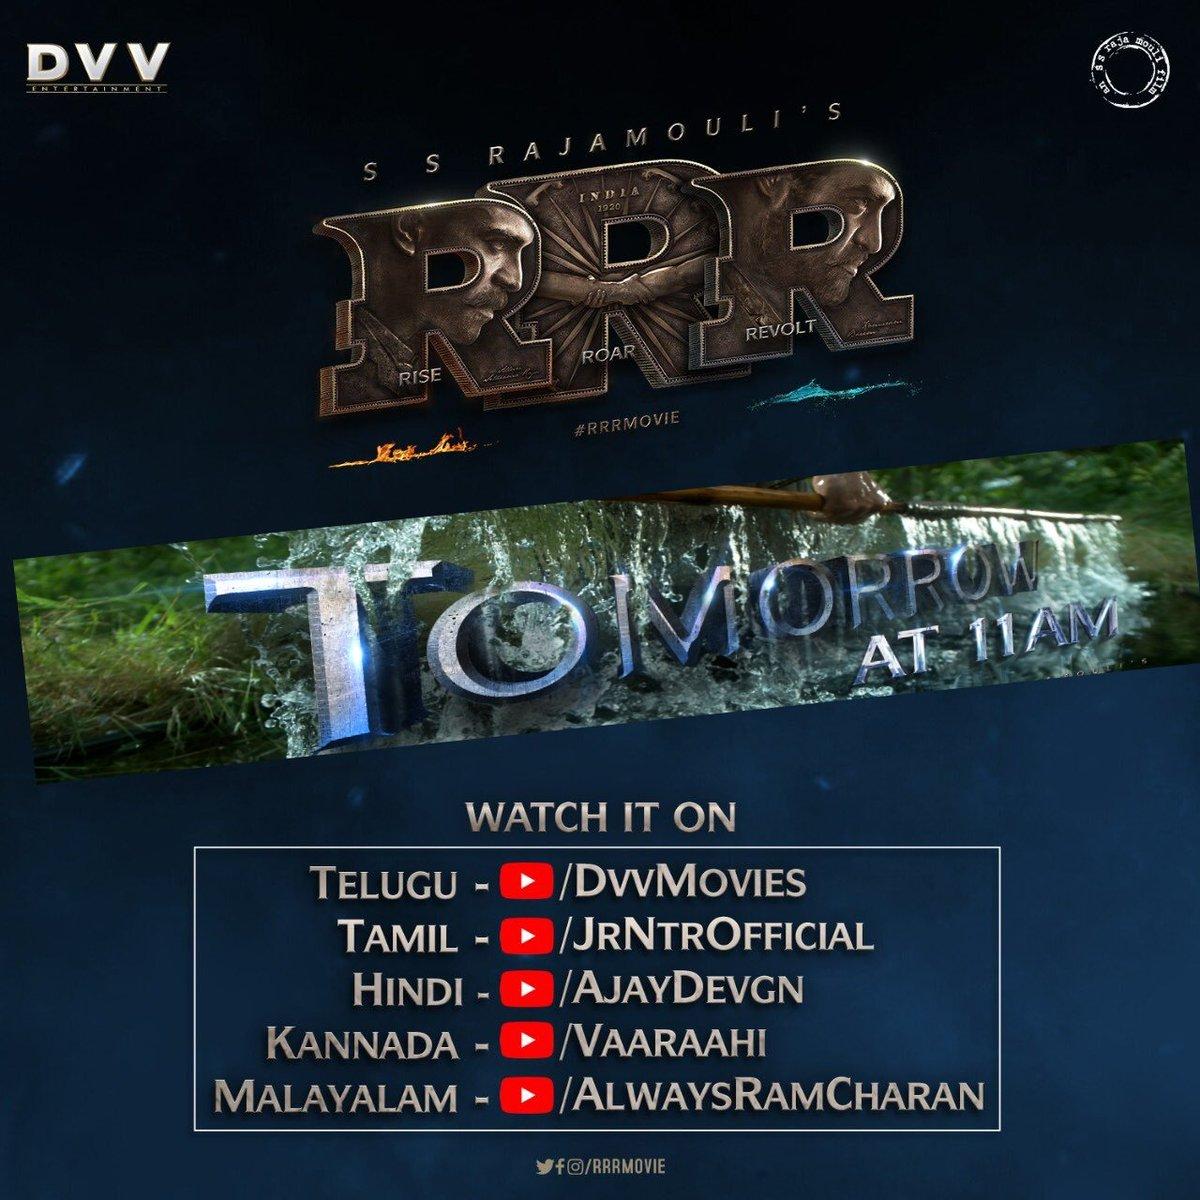 #RamarajuForBheem teaser going to take YouTube and social media on storm from tomorrow at 11 AM onwards. #RRRMovie.  #KomaramBheemNTR. #BheemManiaBegins. #RamarajuForBheemTomorrow.